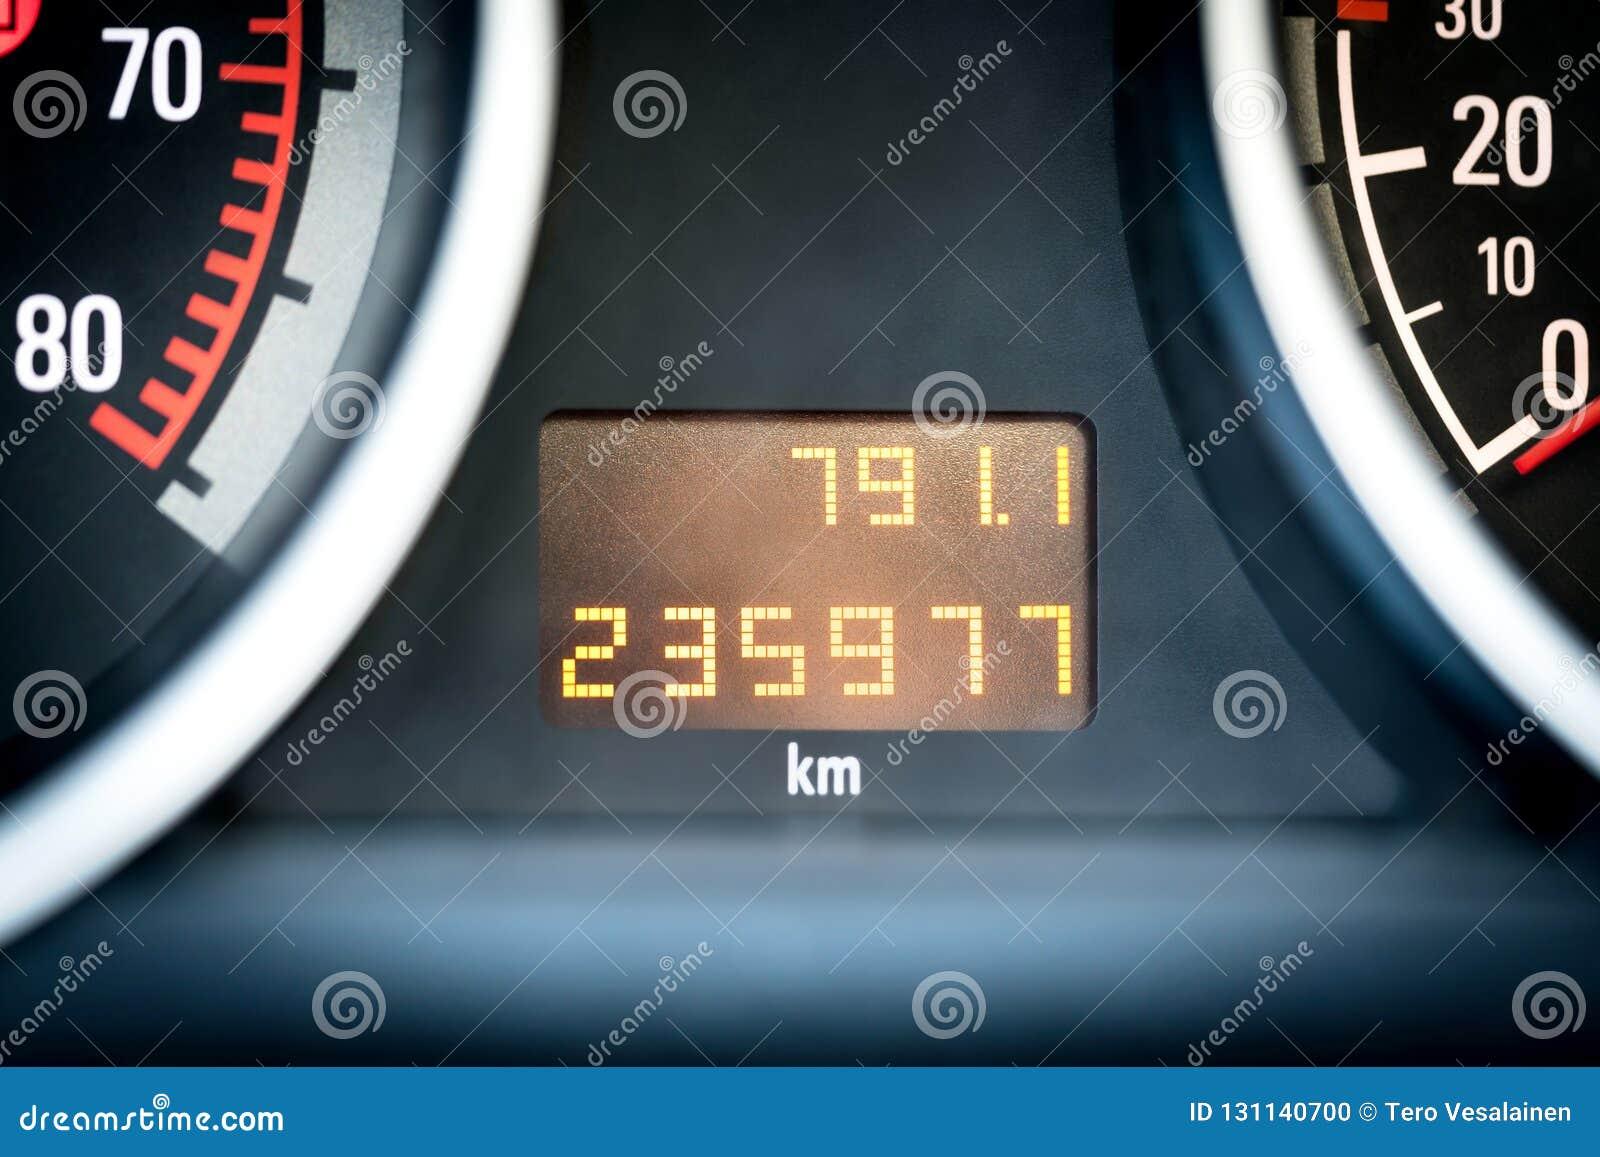 Digital car odometer in dashboard. Used vehicle with mileage meter.